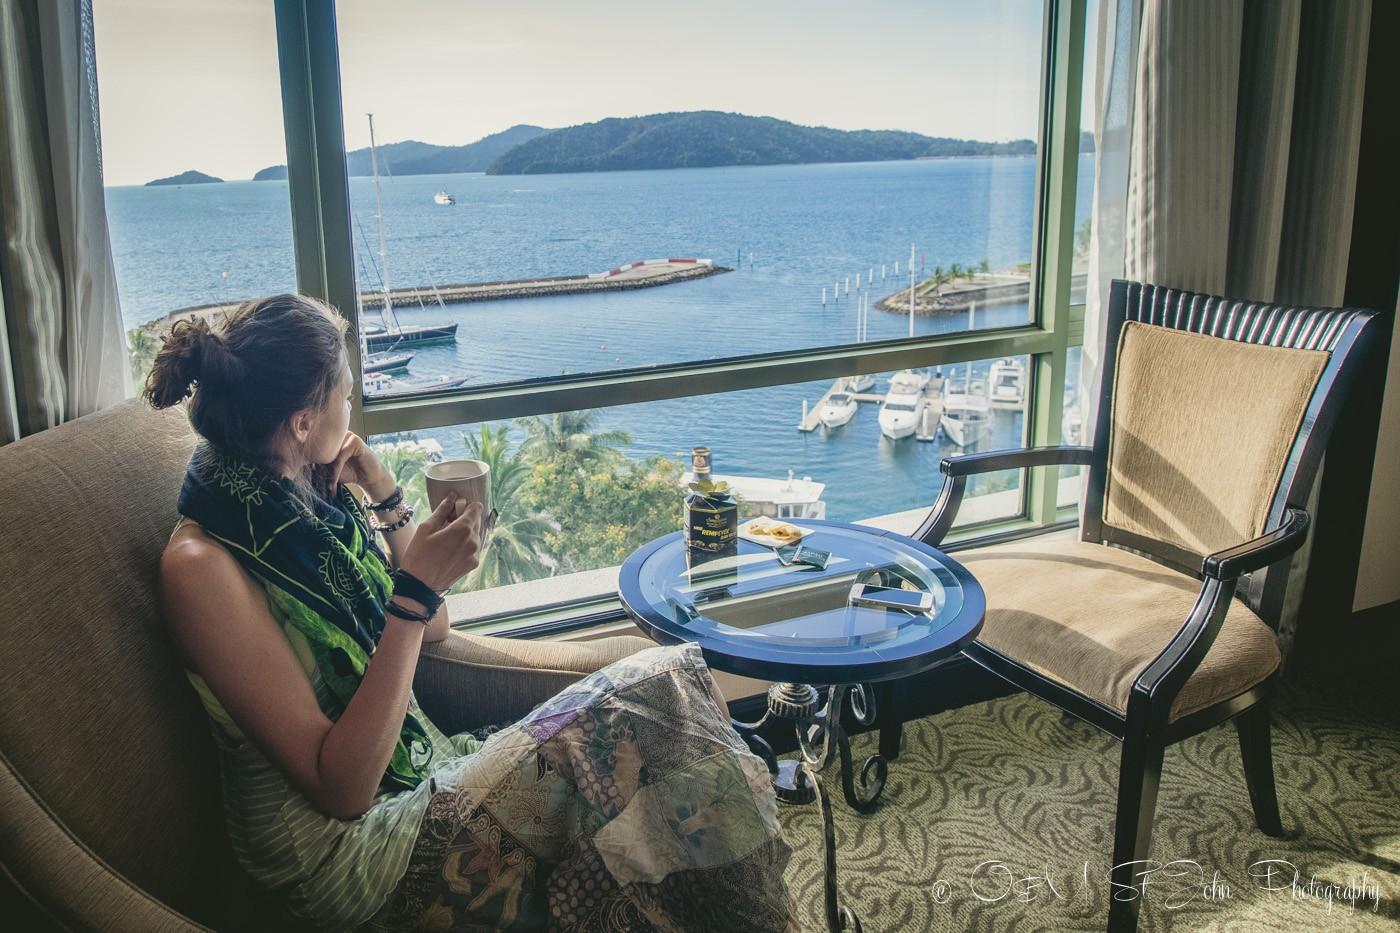 Oksana at the Sutera Hotel in Kota Kinabalu, Malaysia